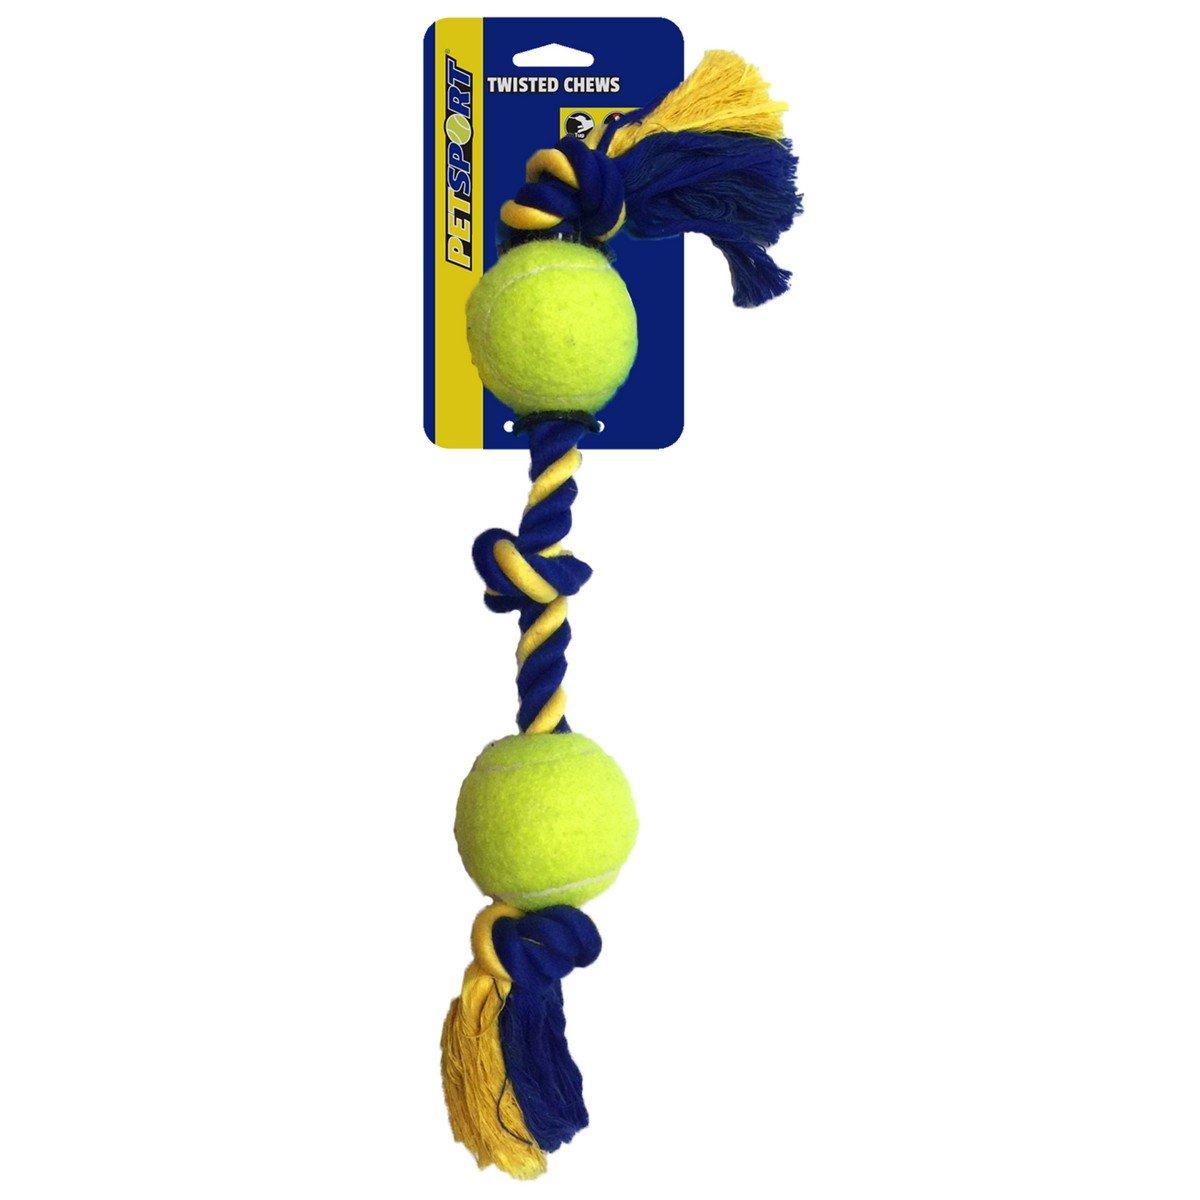 Imagem de Agradi 3 Knot Cotton Rope with 2 Tuff Balls 6cm